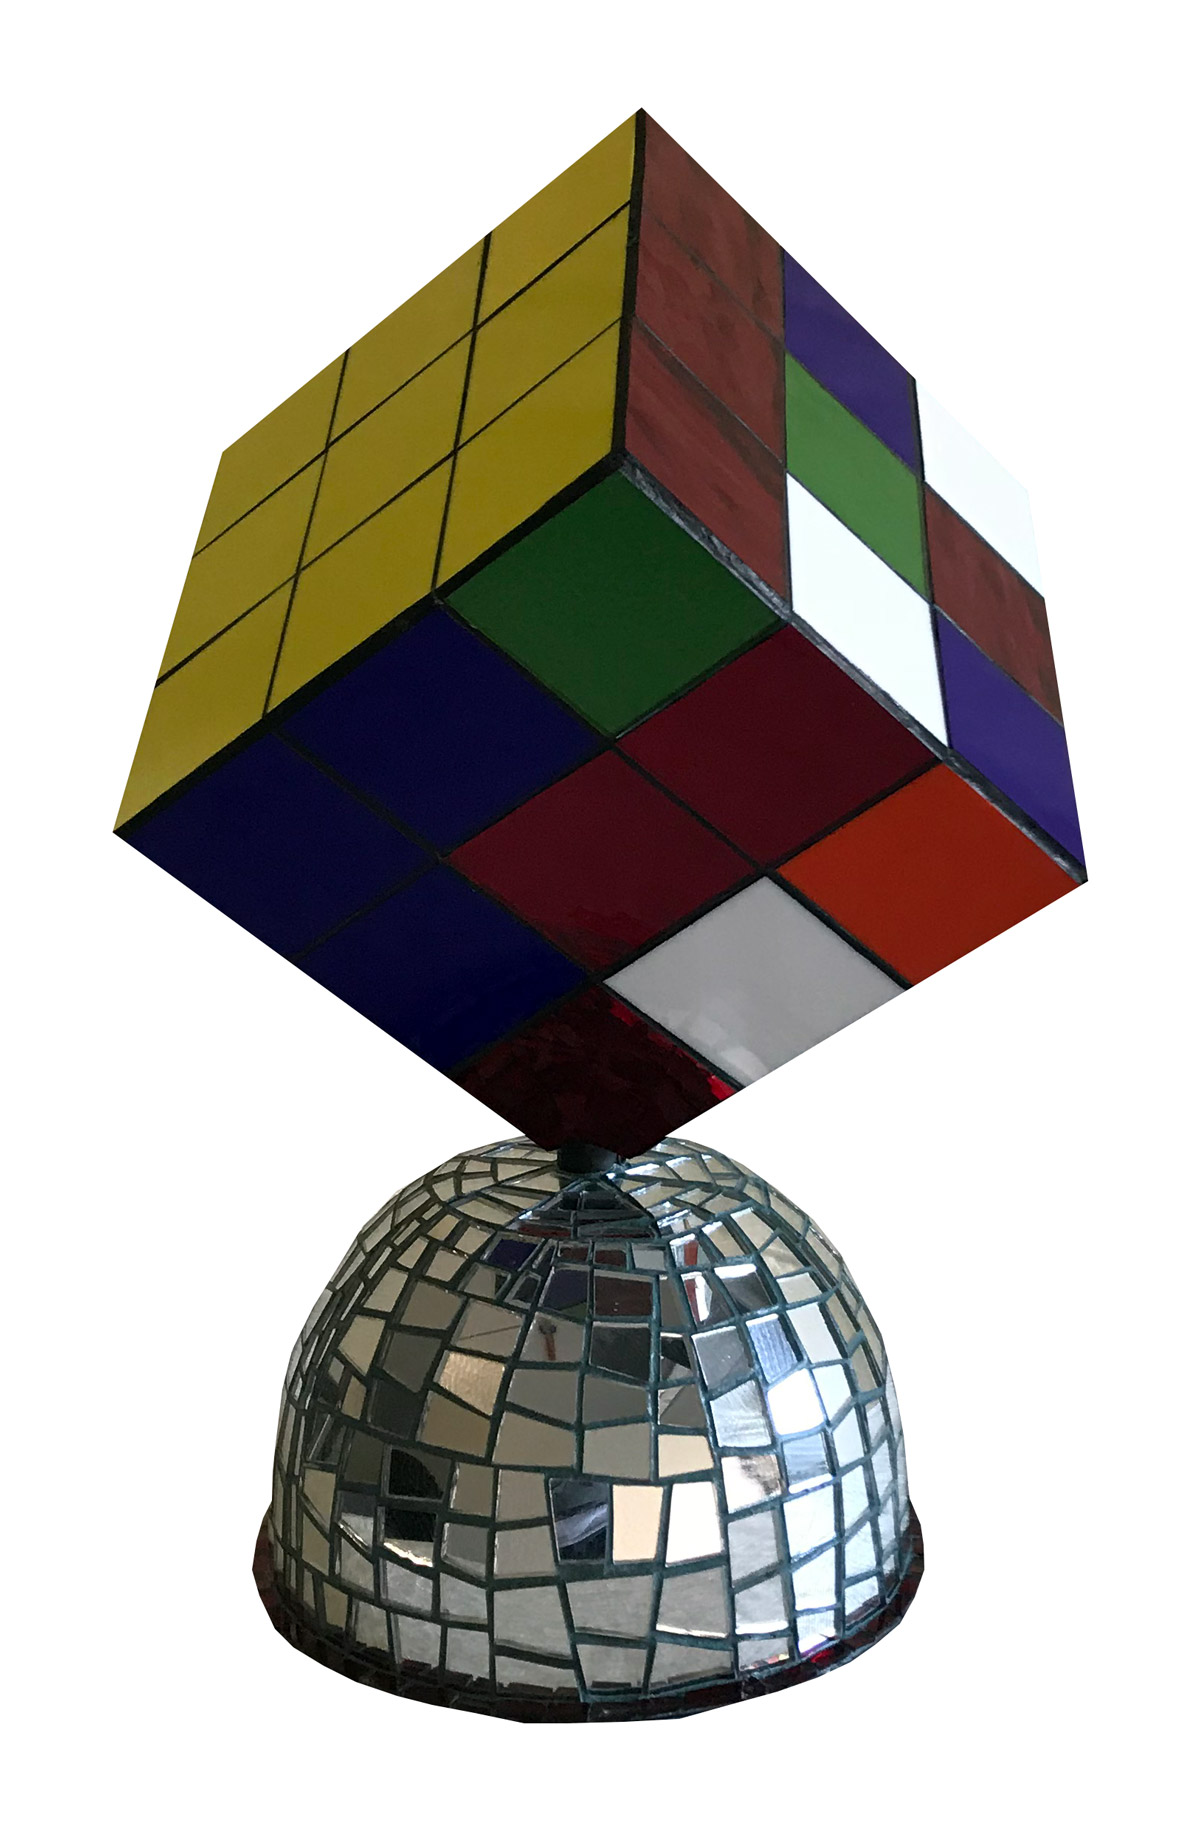 rubik's-cube-2.jpg